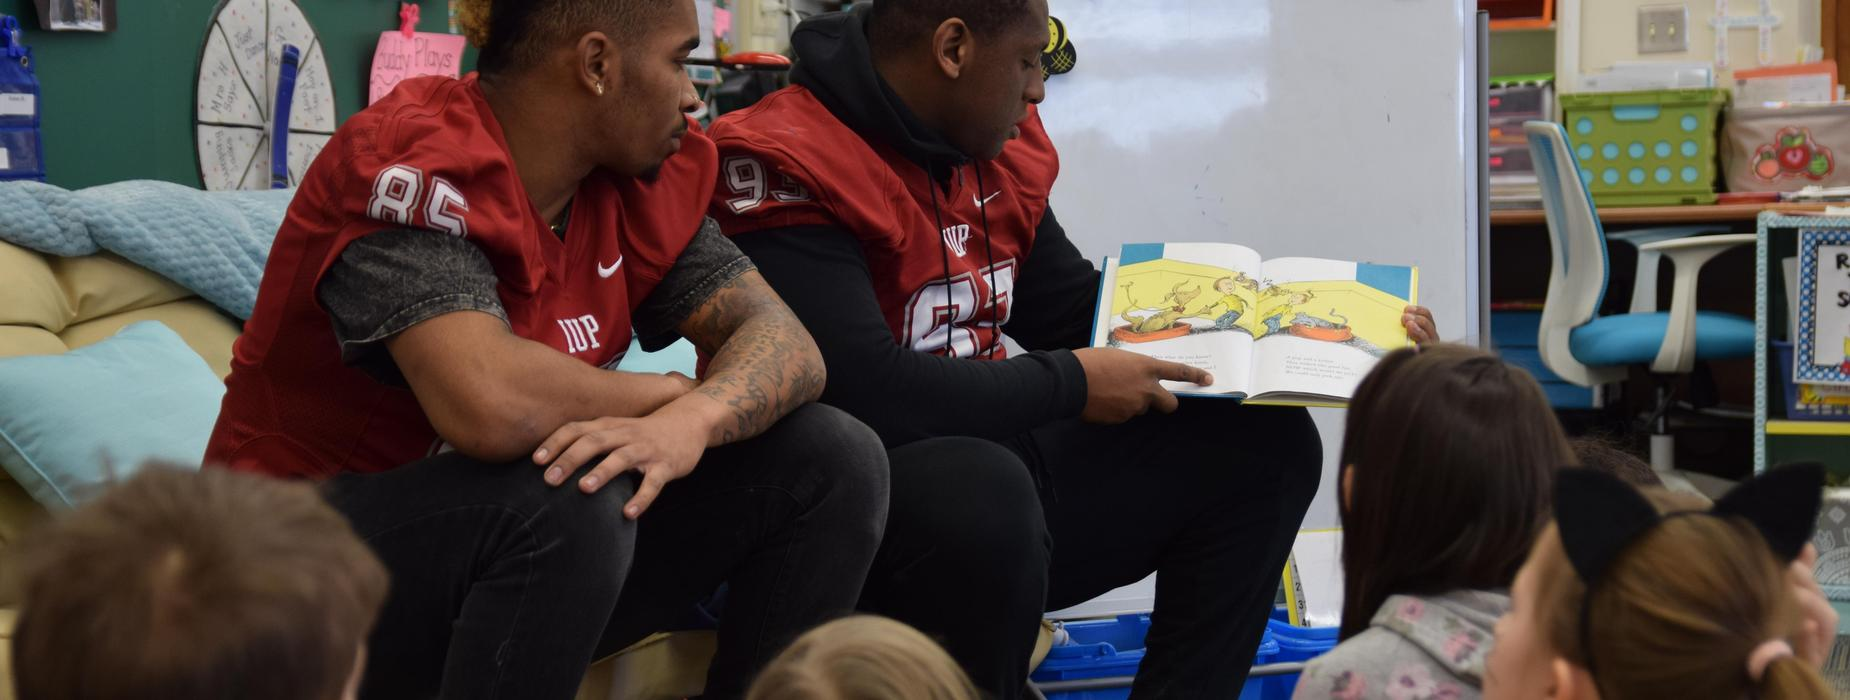 IUP Football players reading